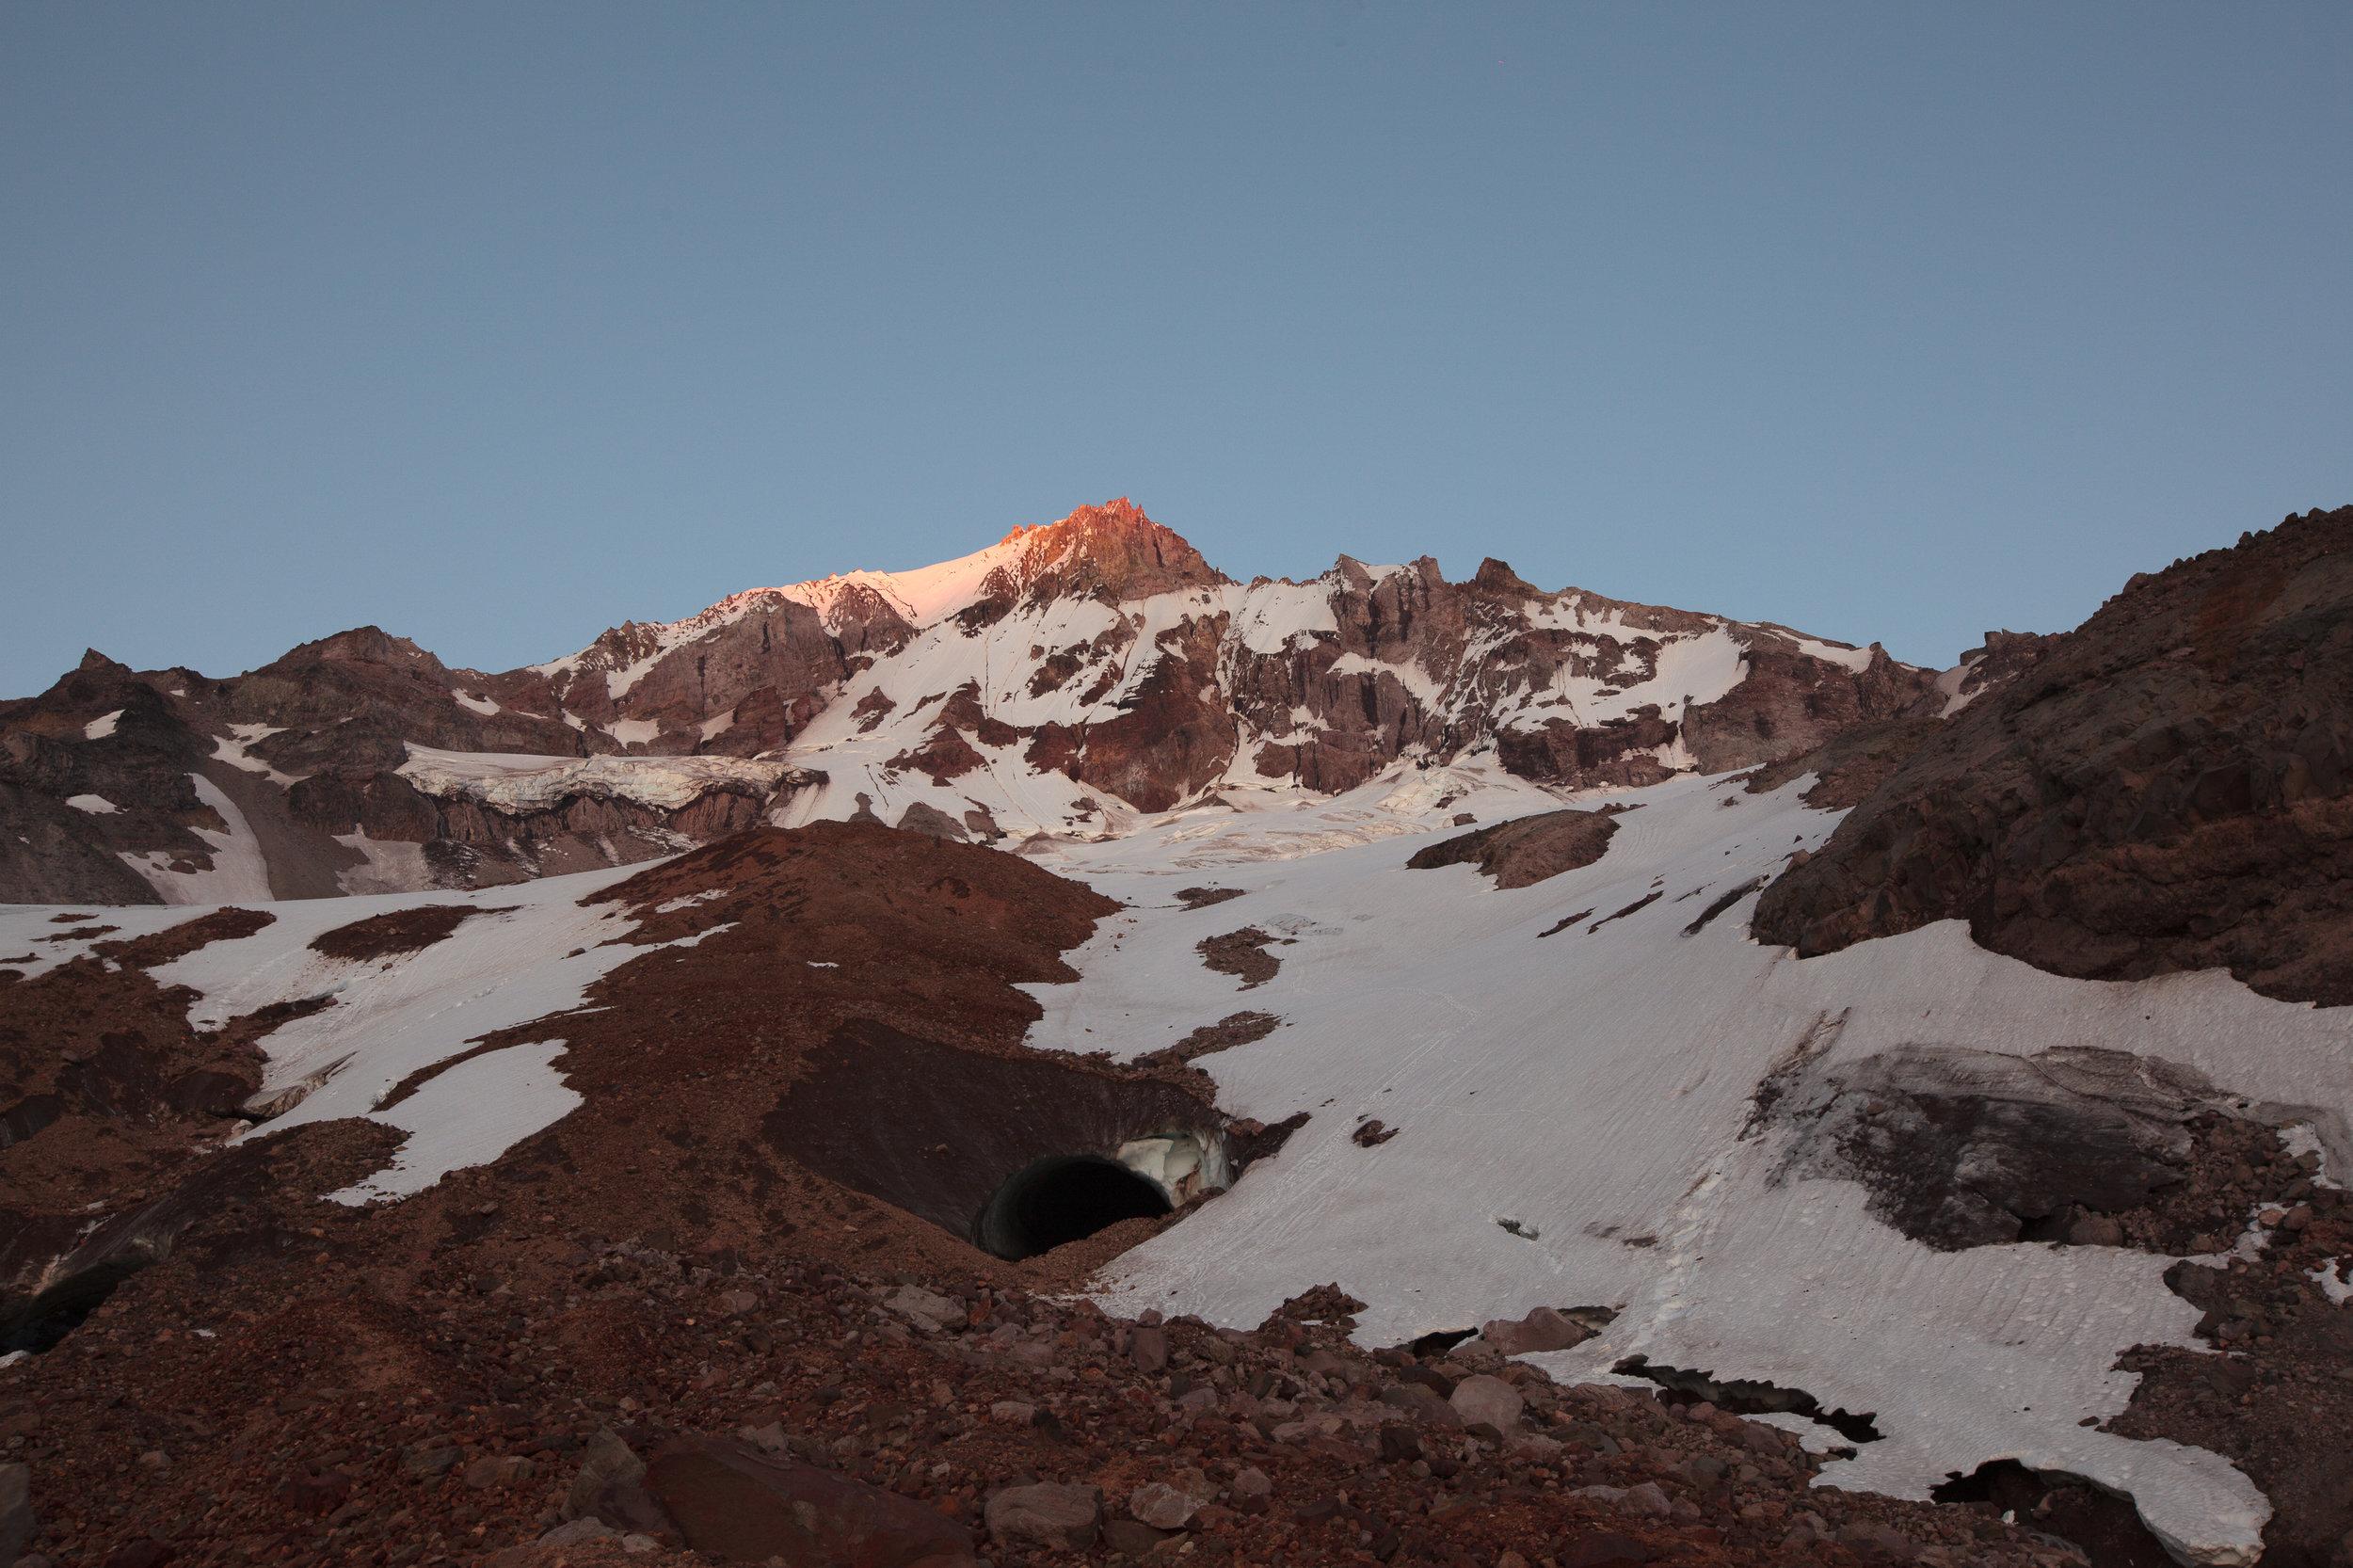 alpenglow on the mountain top-1651.jpg